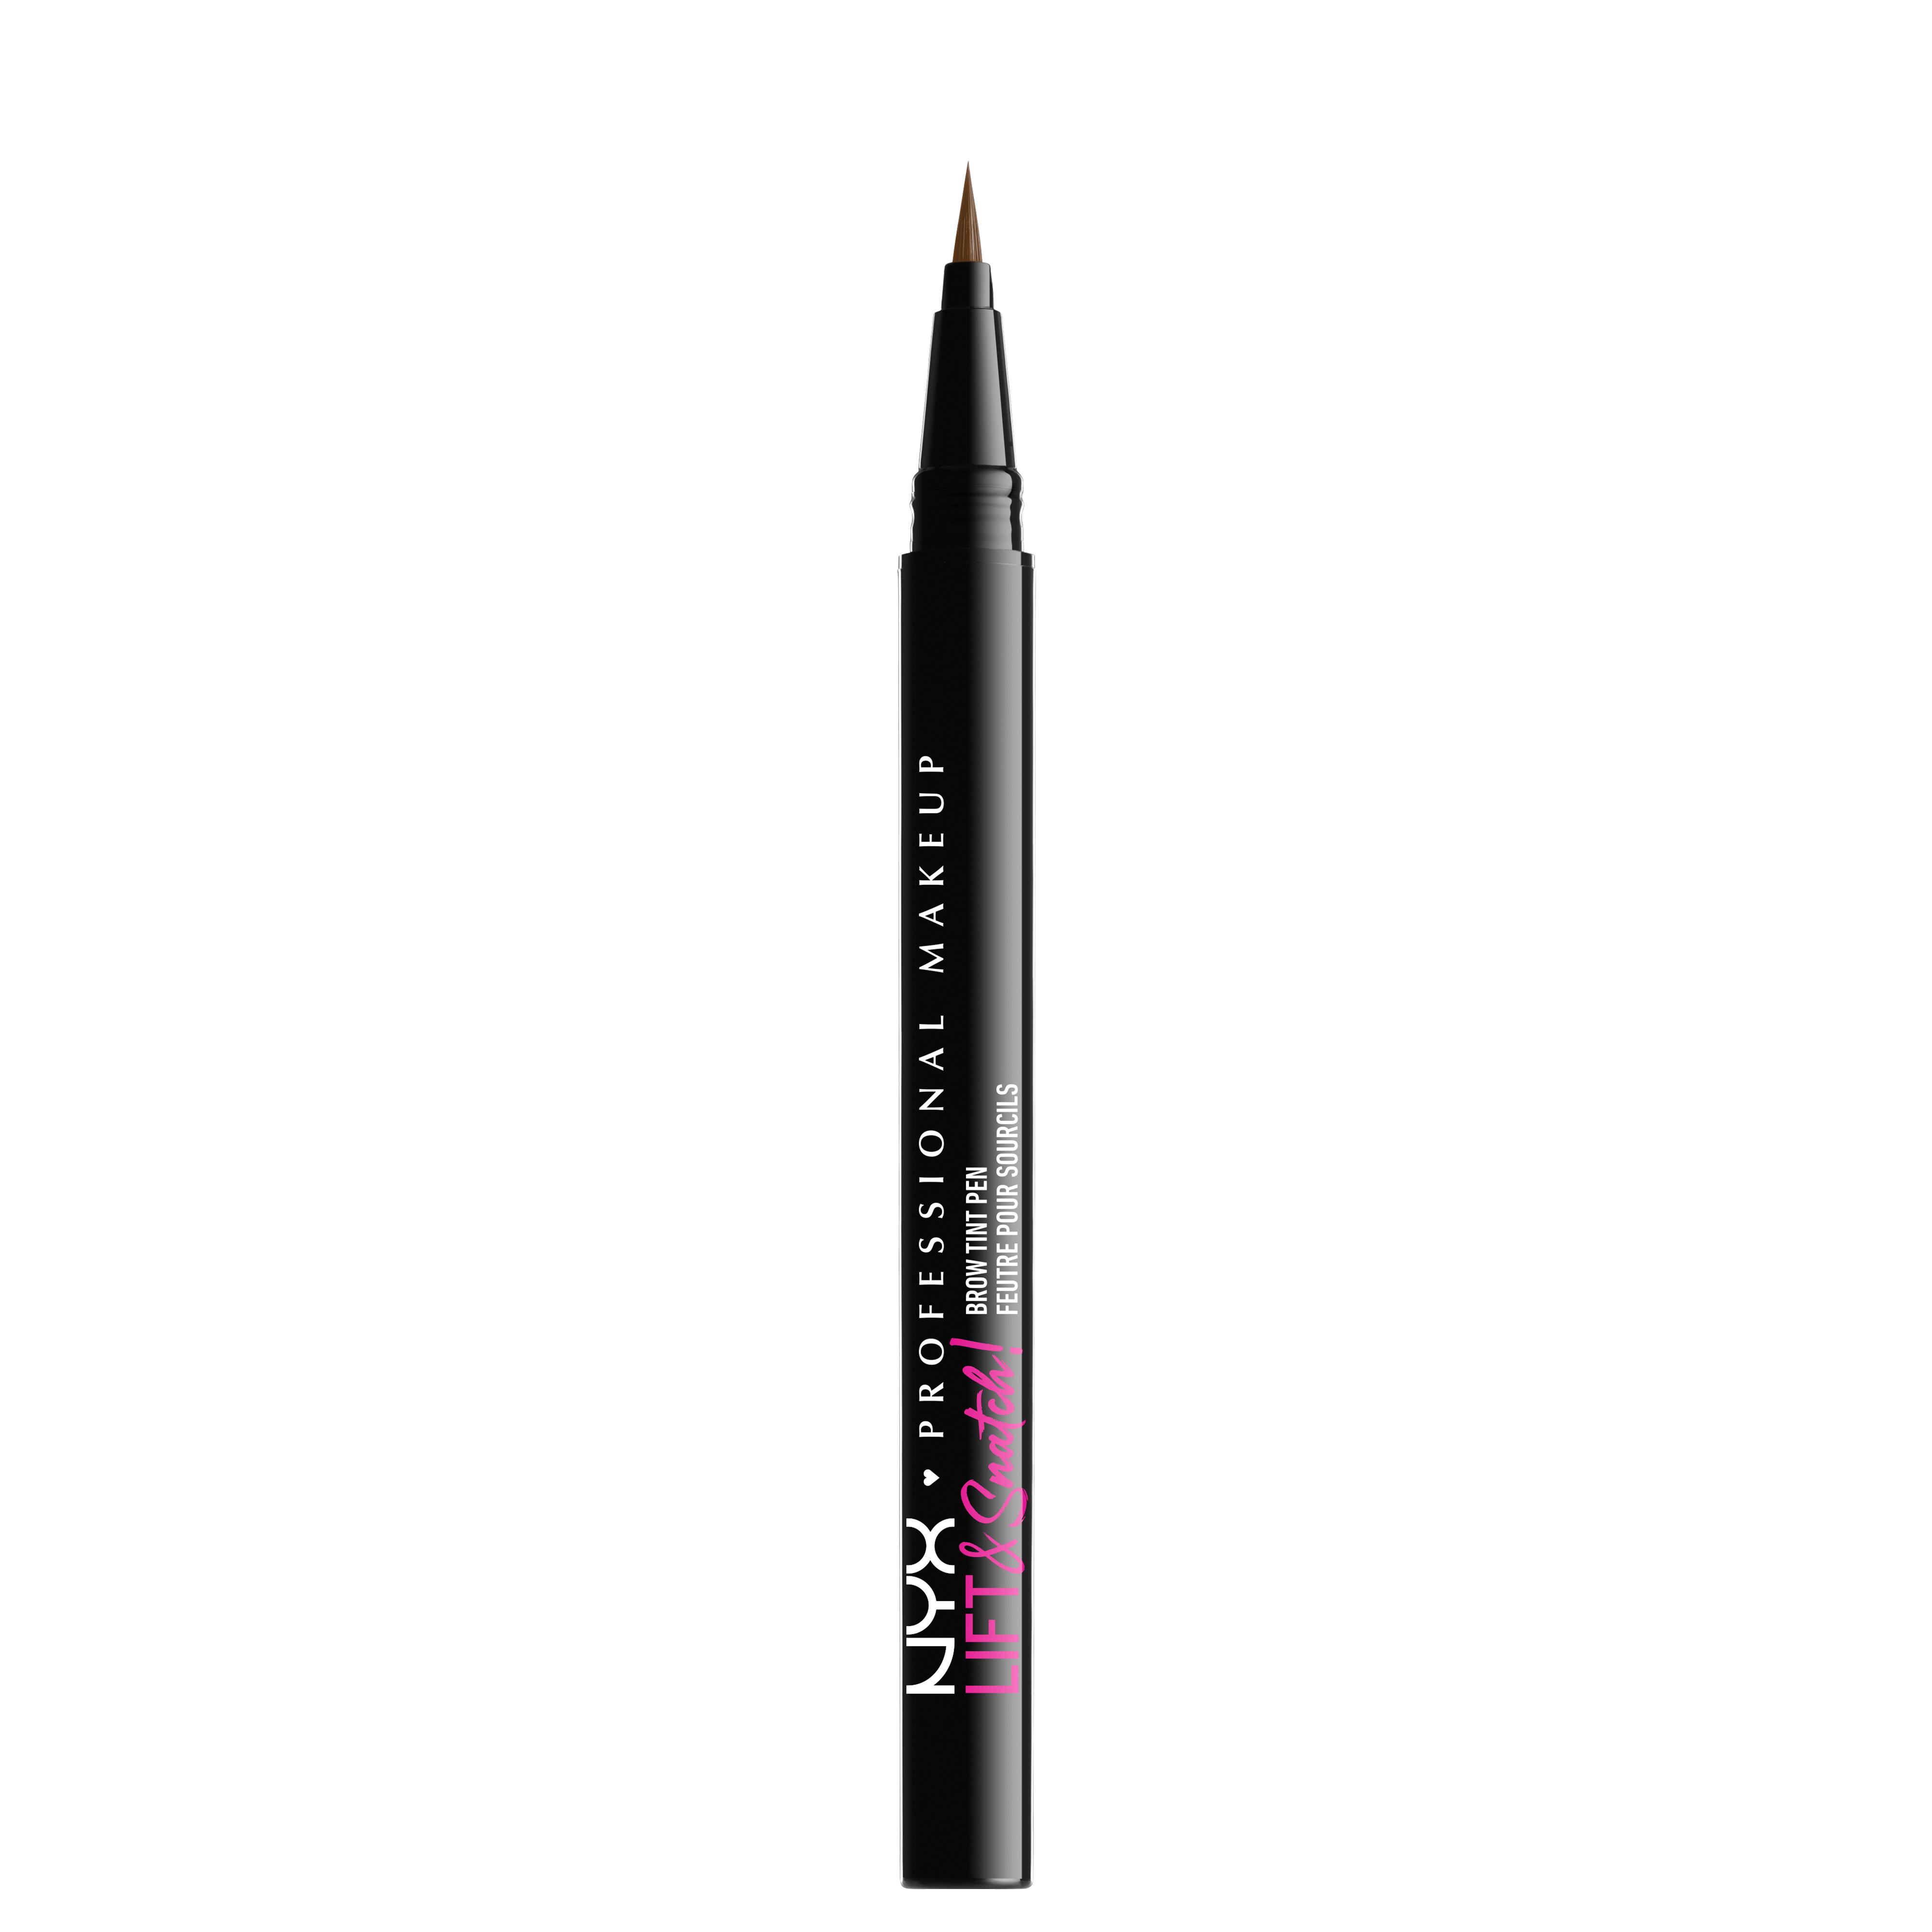 NYX Professional Makeup - Lift & Snatch! Brow Tint Pen - Brunette